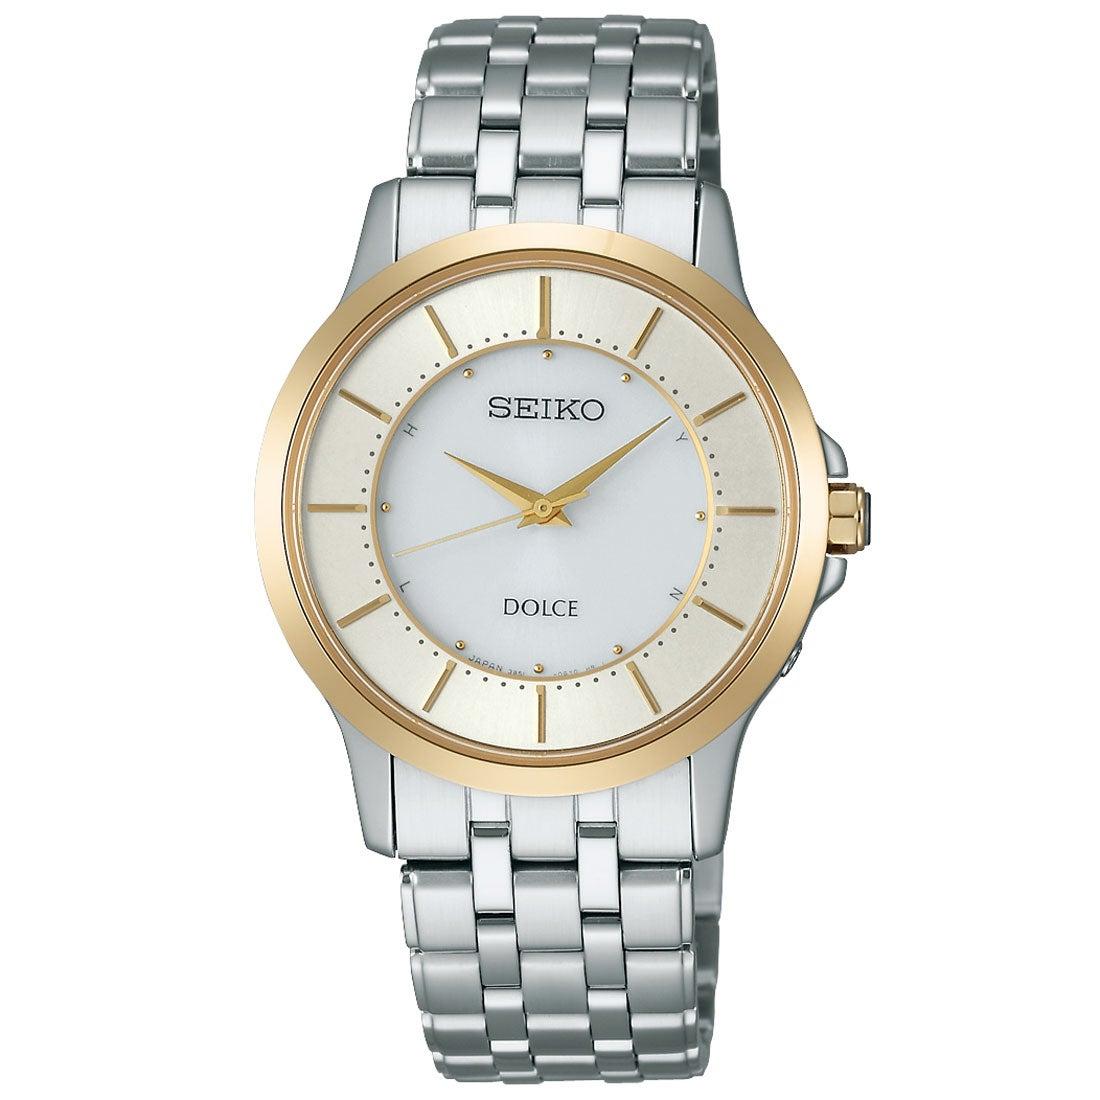 SEIKOドルチェユニセックス腕時計